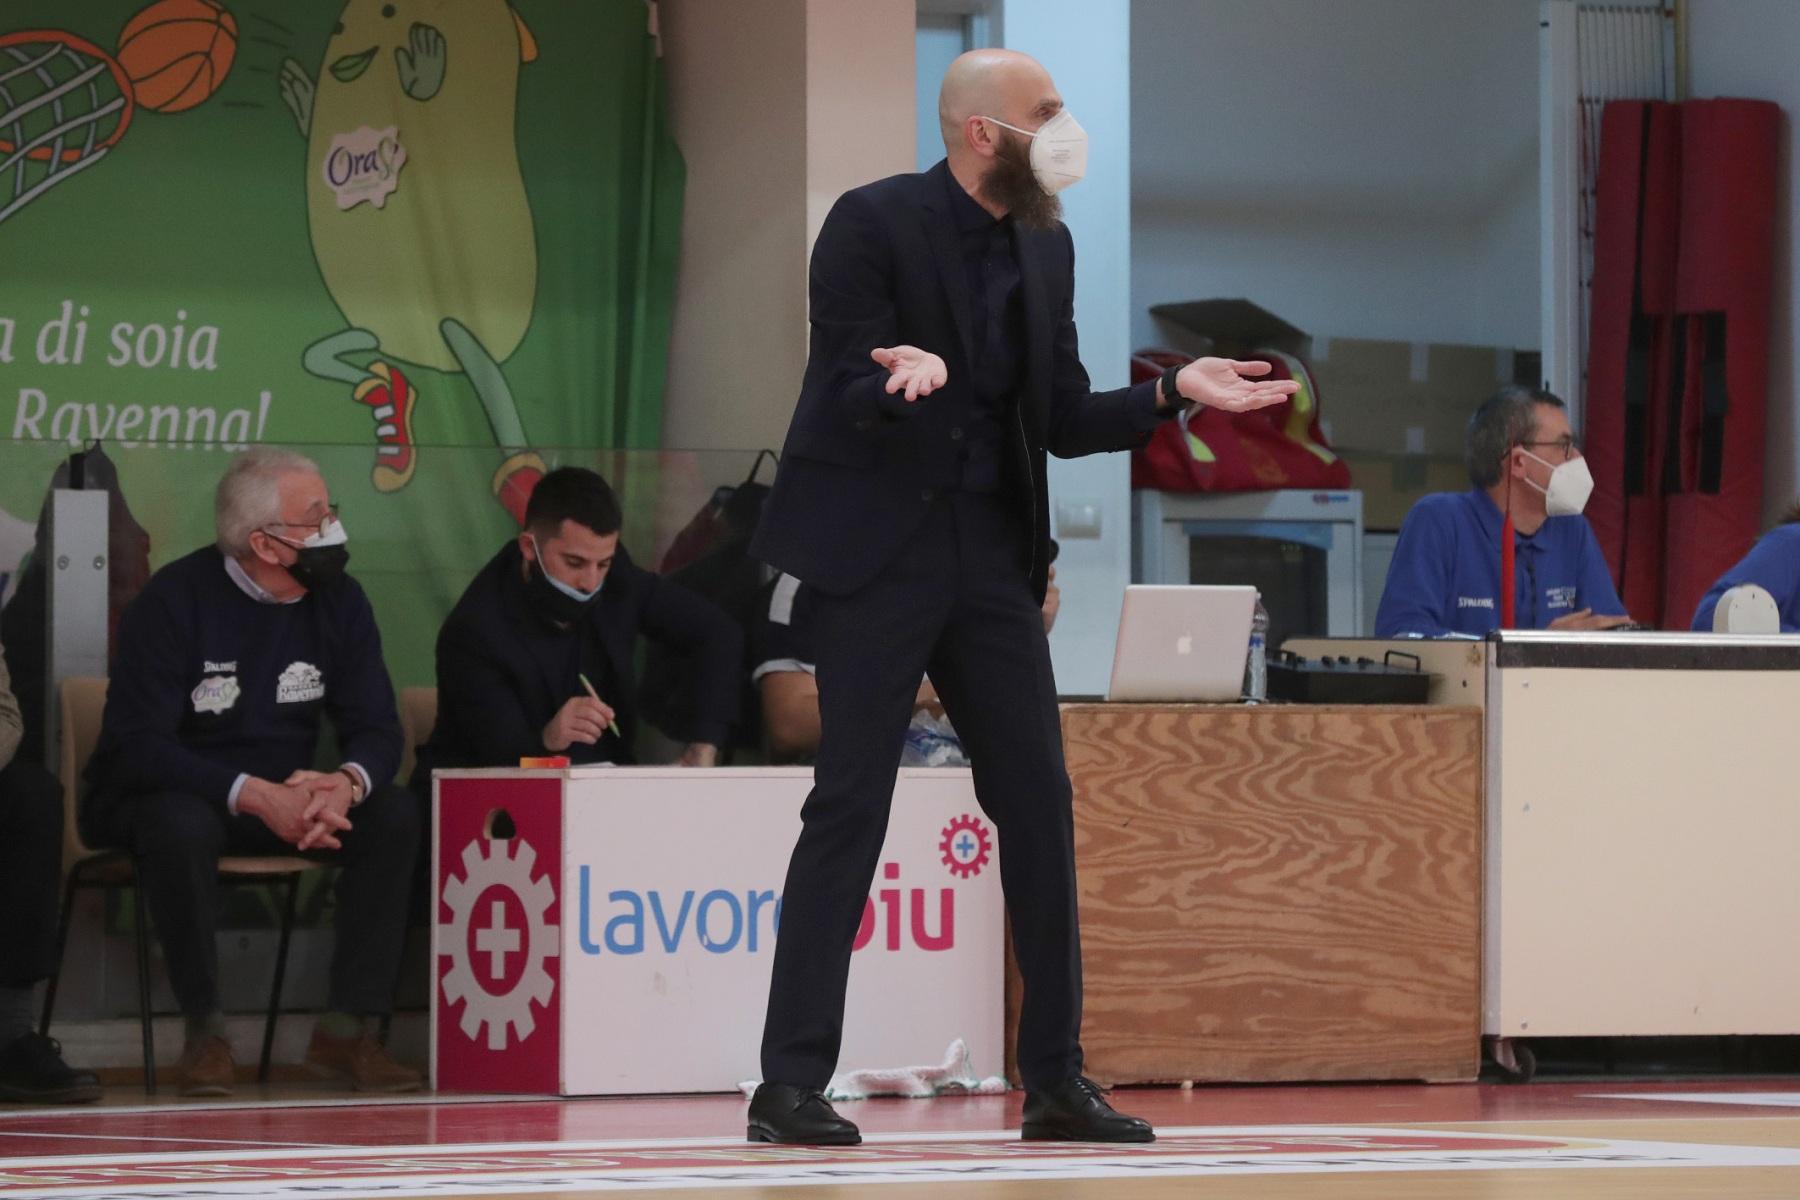 LNP serie A2, seconda giornata.  OraSi Ravenna - Unieuro Forlì.